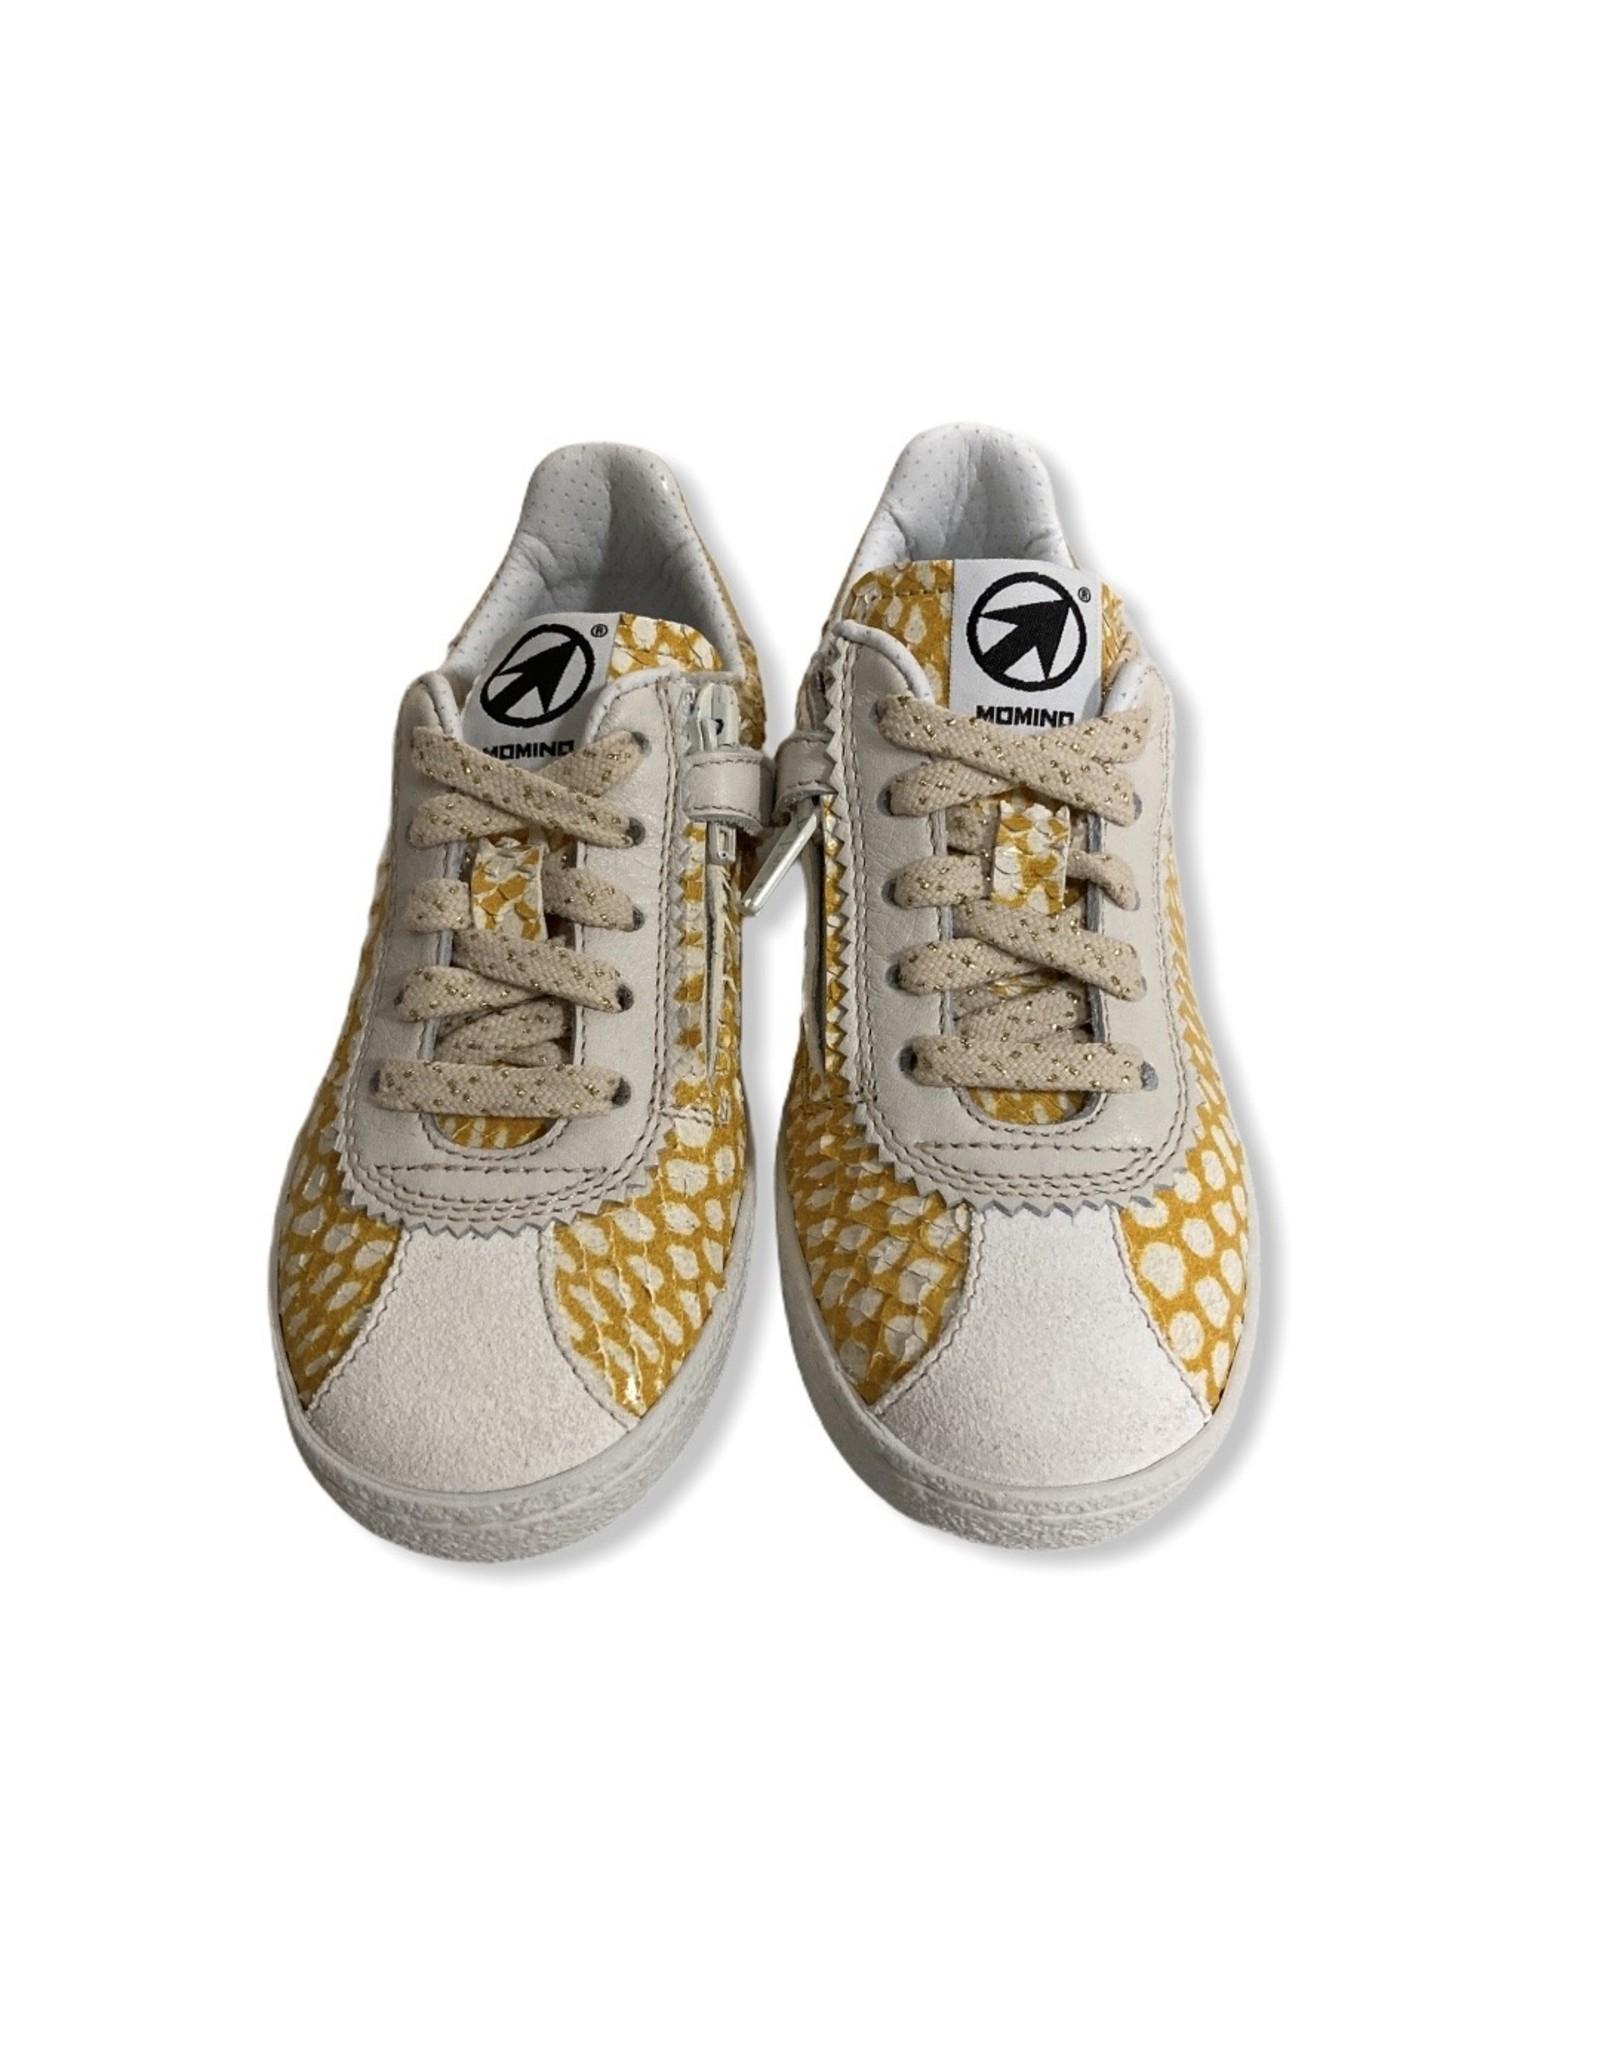 Momino Momino gele snake sneaker